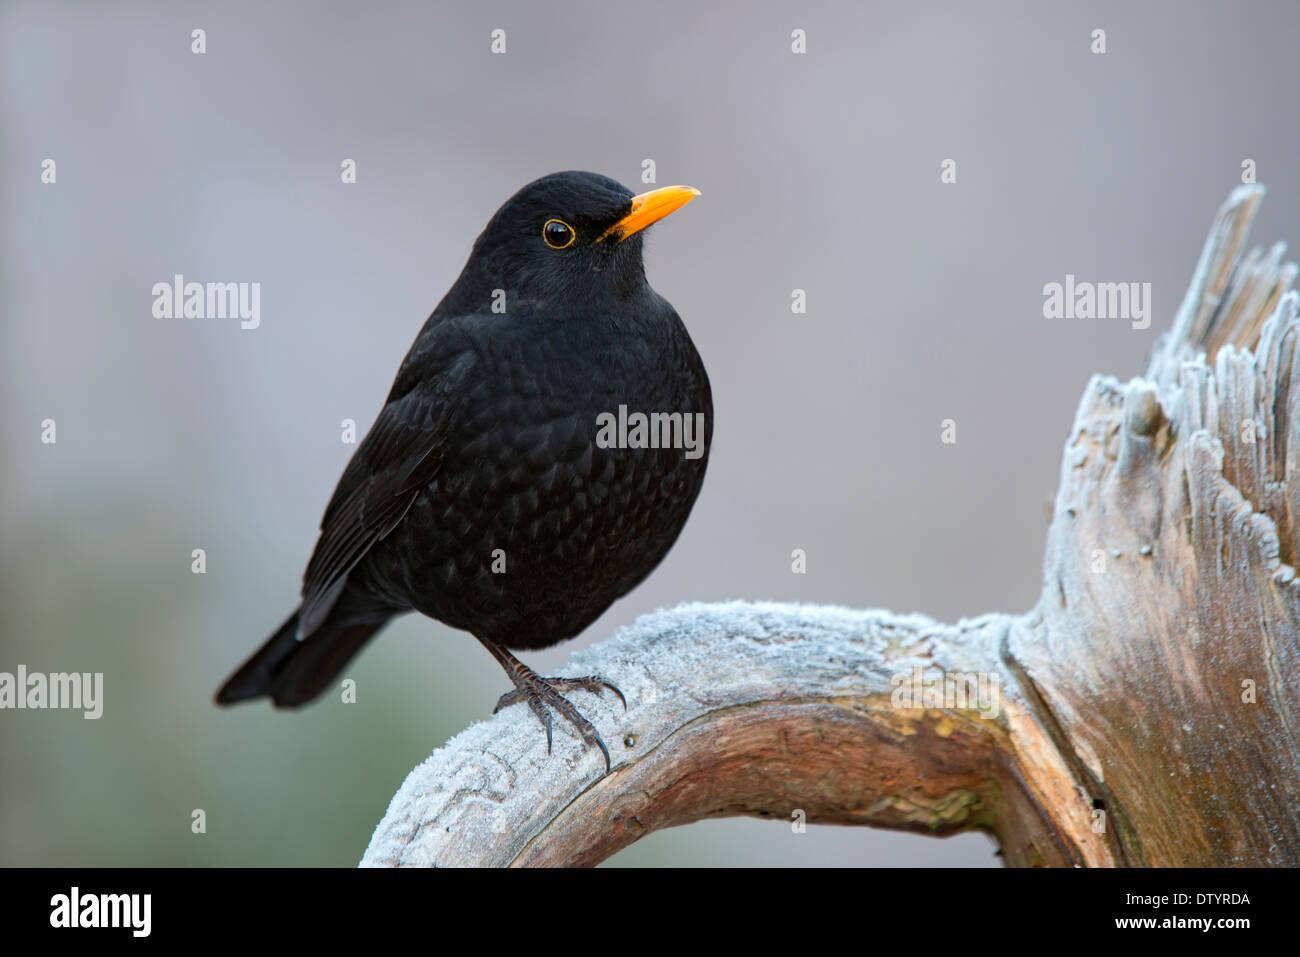 Blackbird (Turdus merula), male, Tyrol, Austria - Stock Image